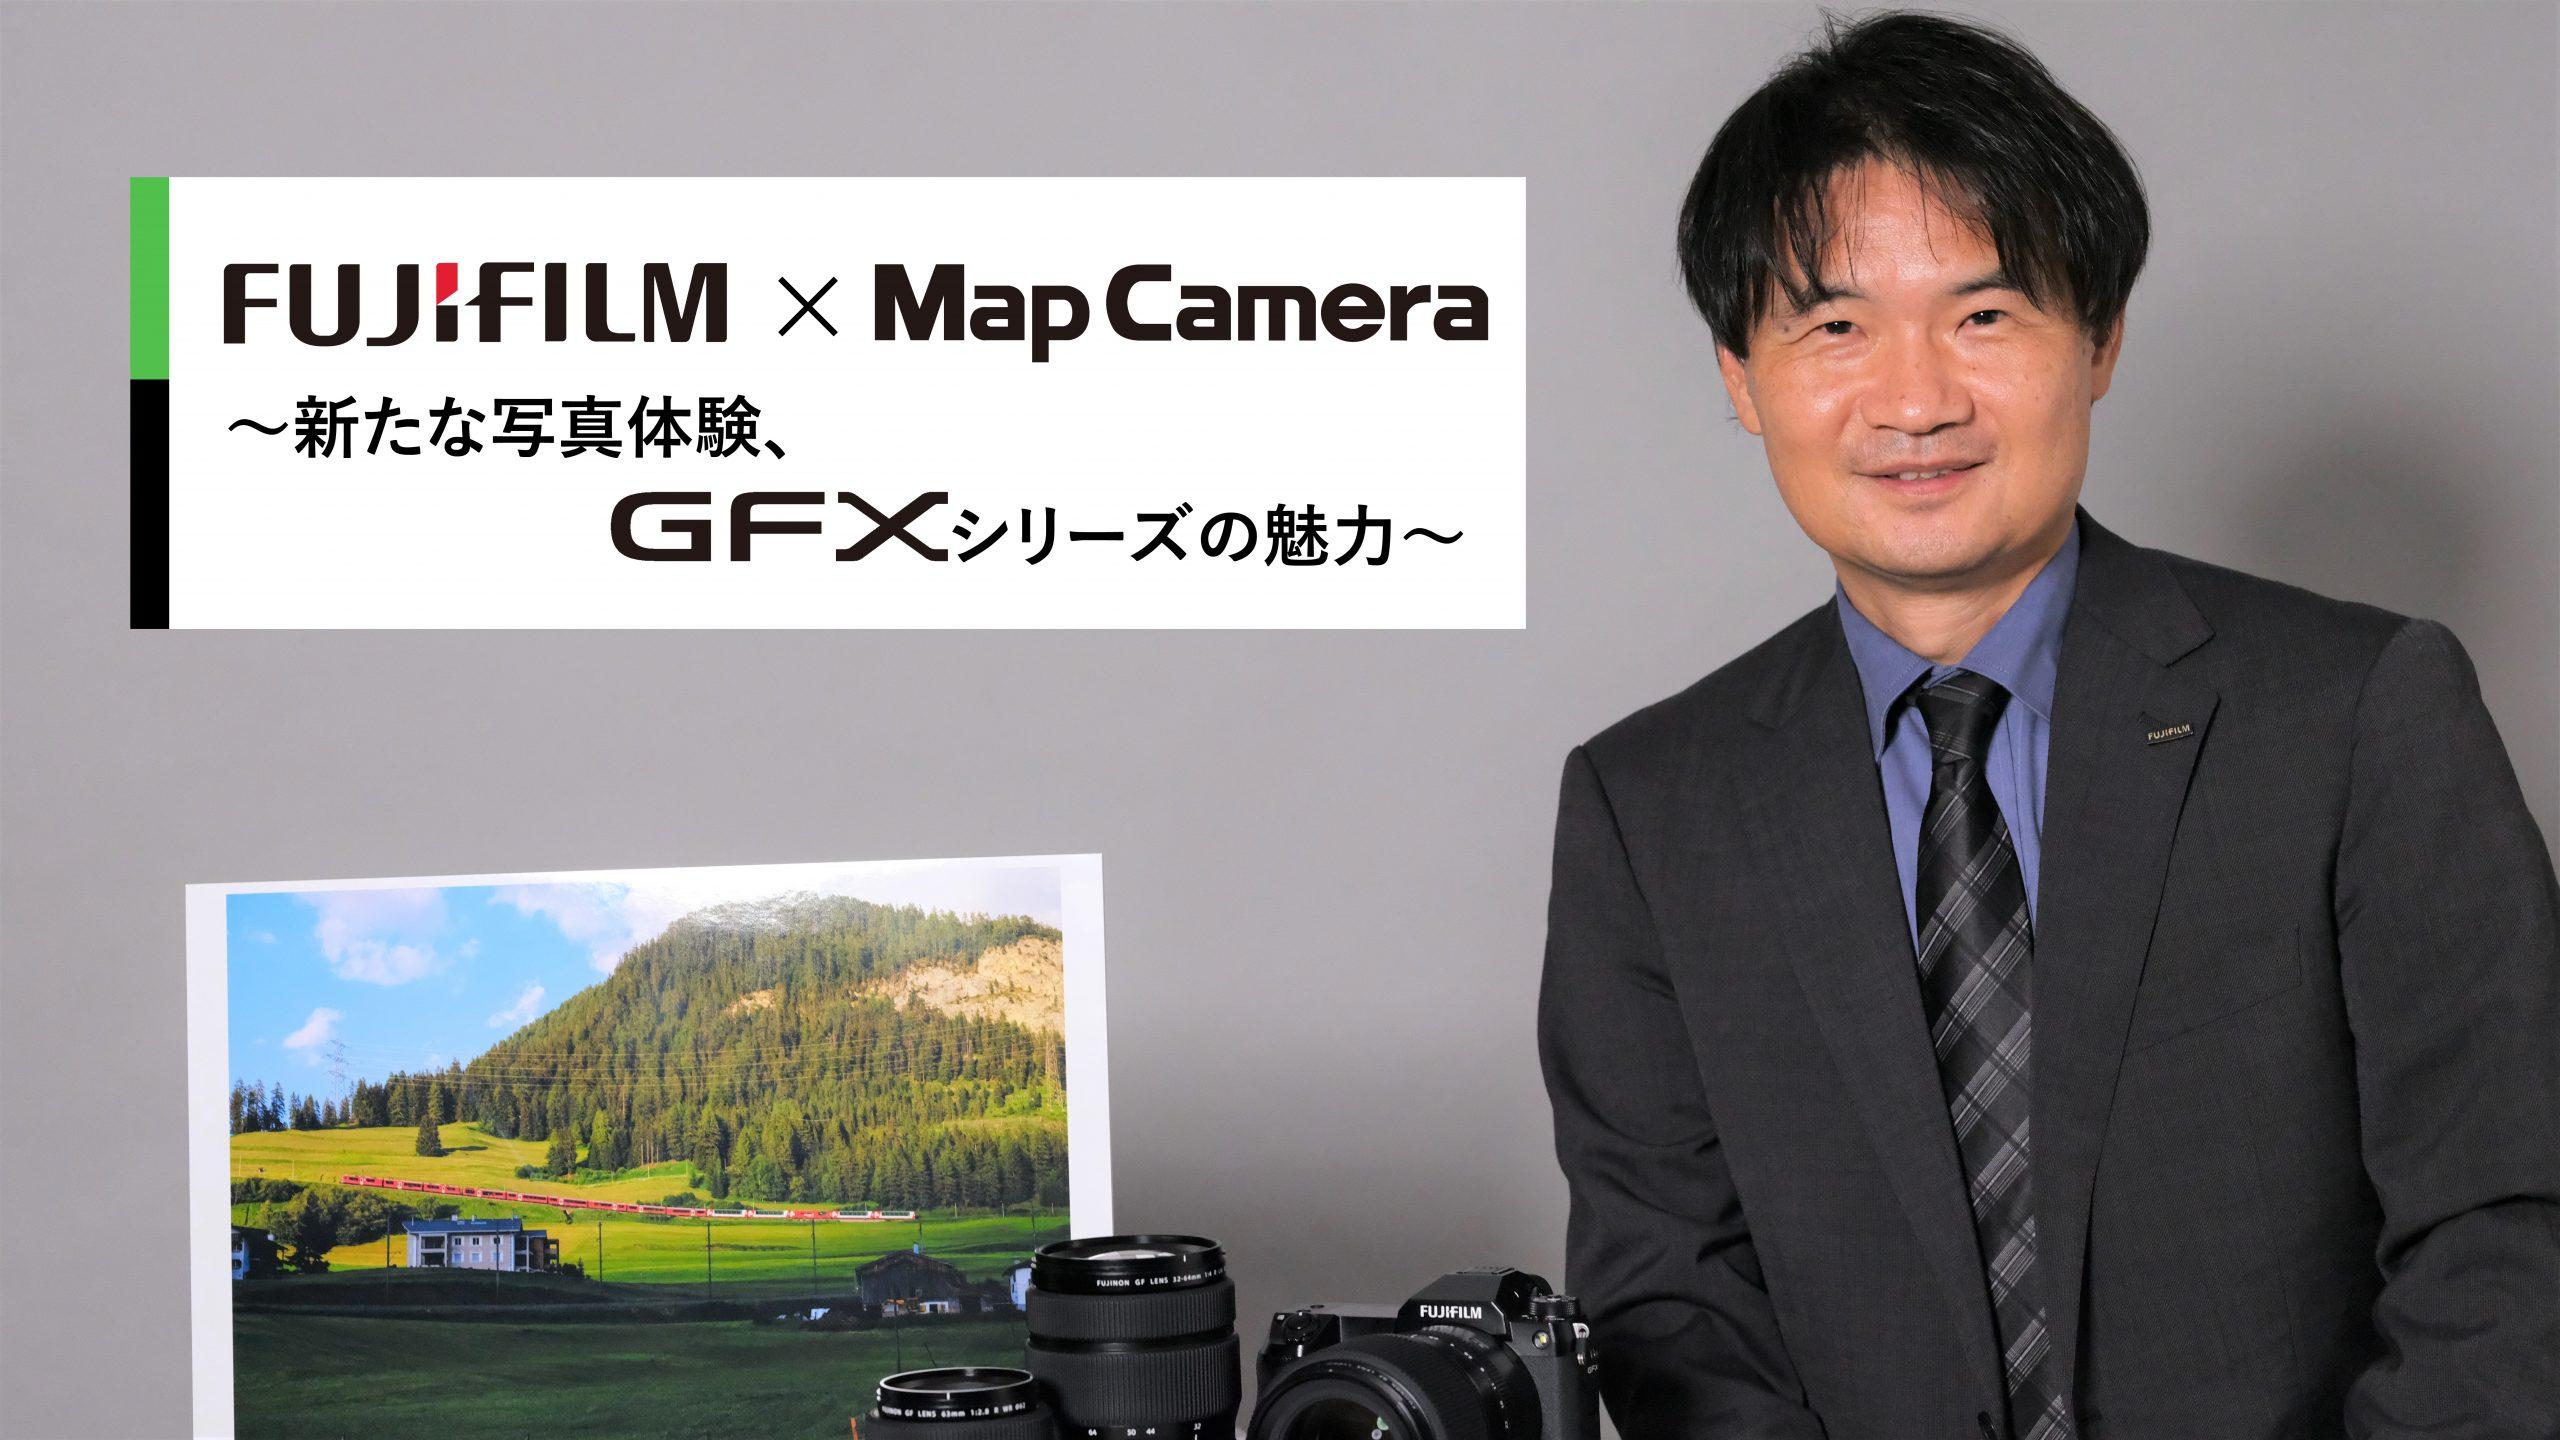 【FUJIFILM独占インタビュー】 新たな写真体験、GFXシリーズの魅力